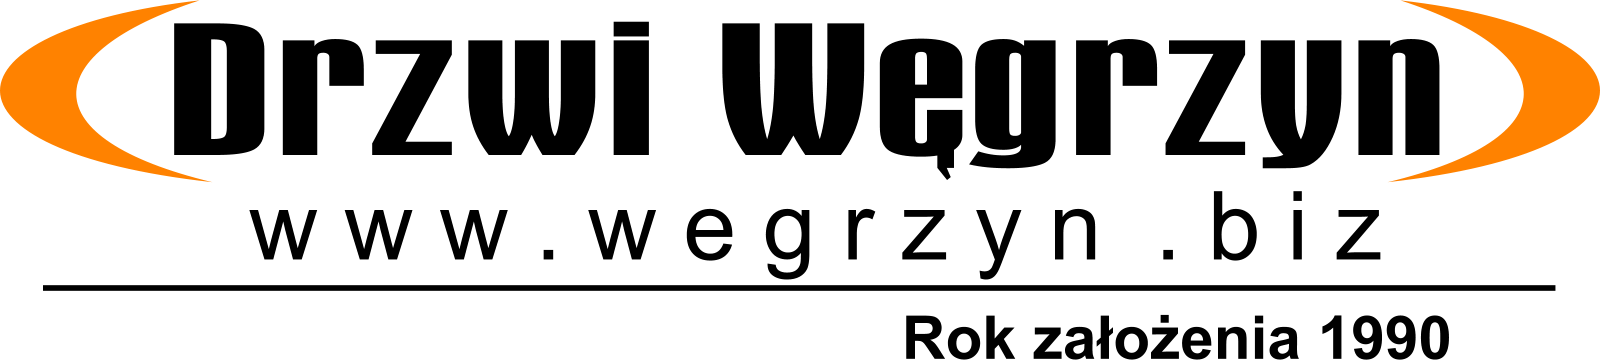 Węgrzyn